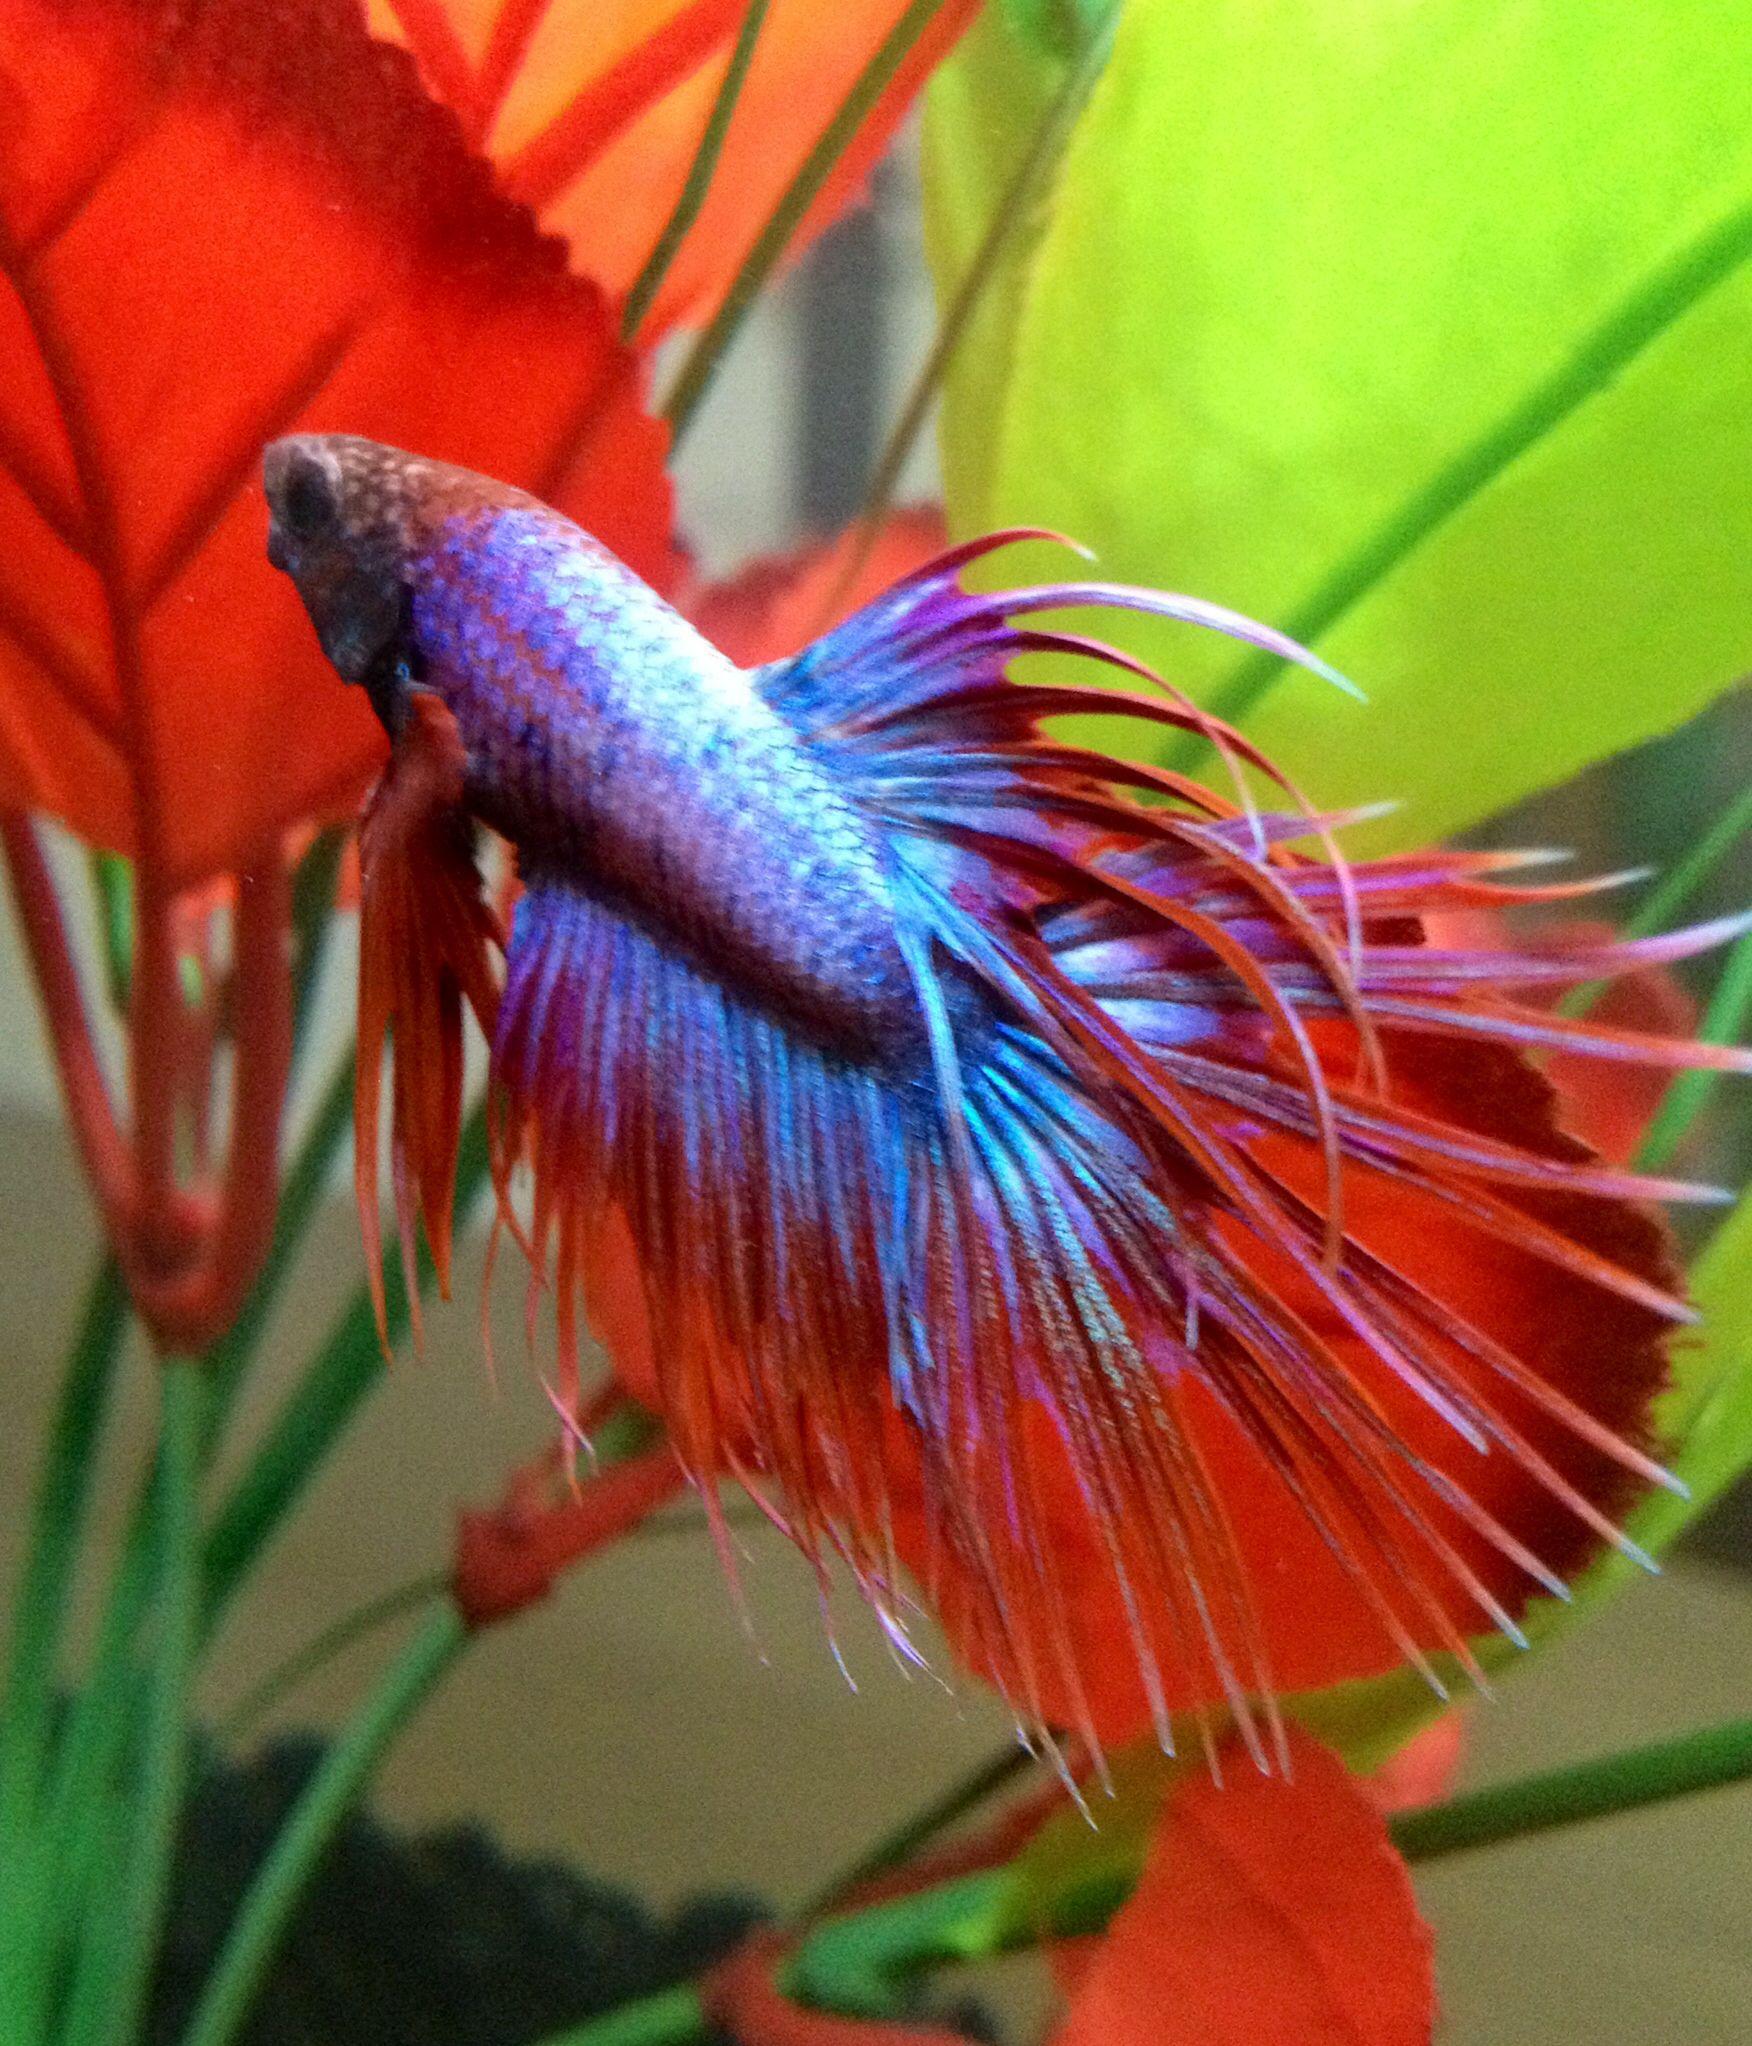 Beautiful Crowntail Betta | Betta fish, Betta tank, Betta - photo#9